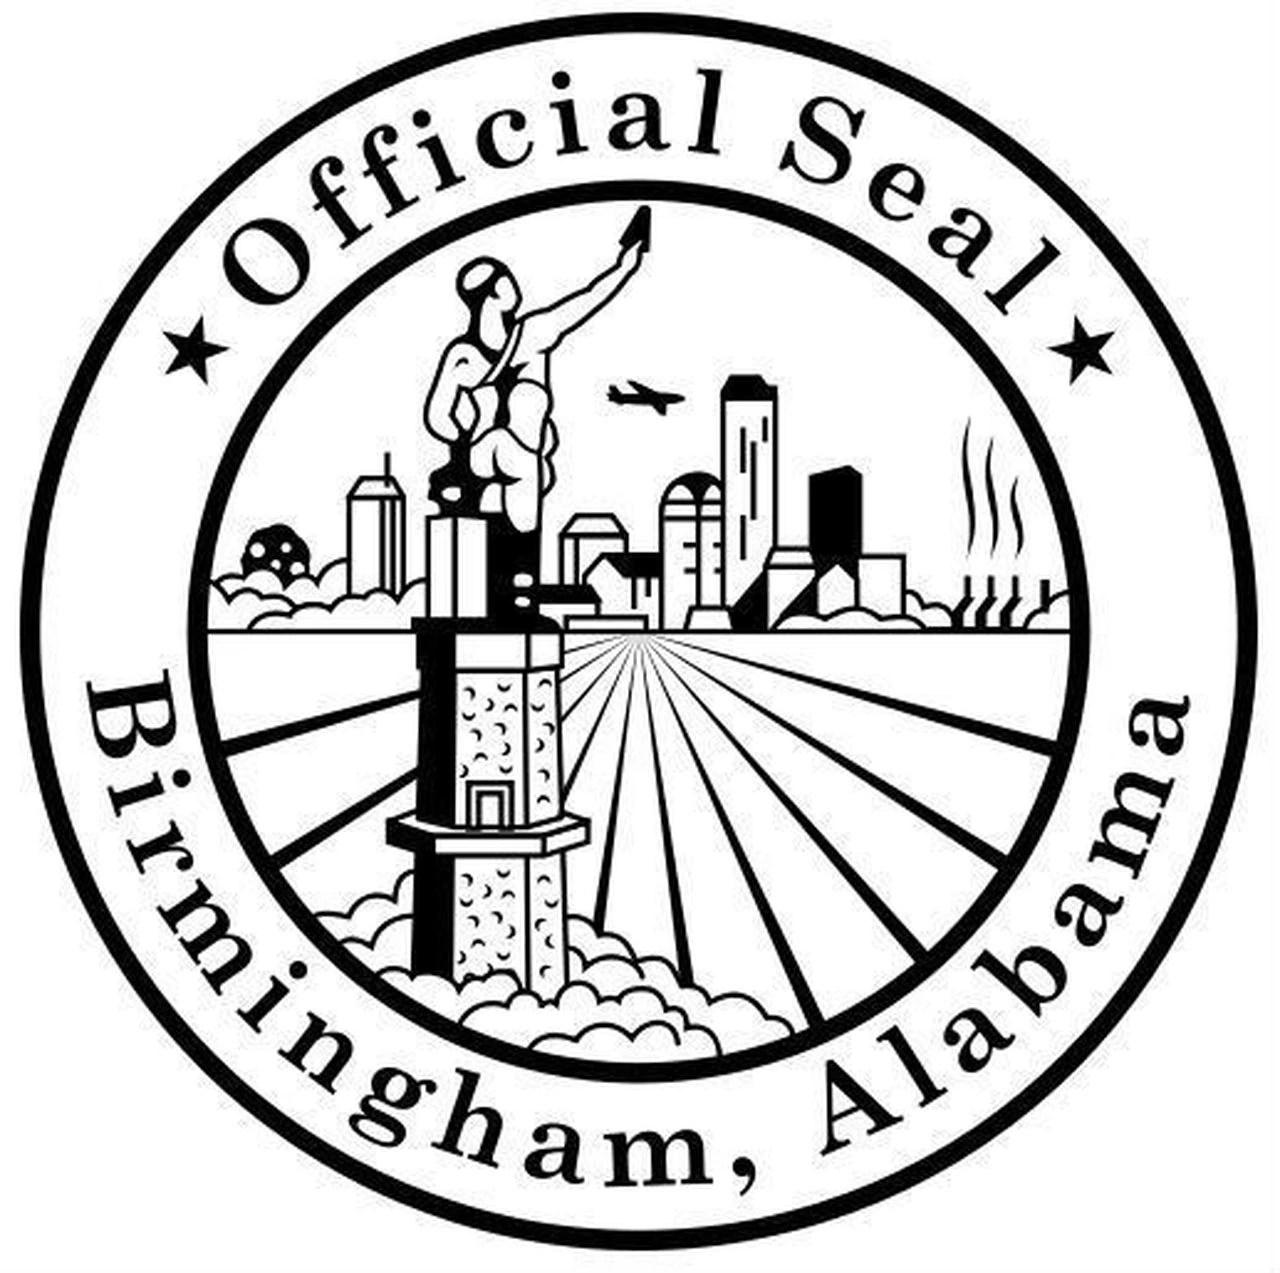 Birmingham adopts new, stronger property maintenance code